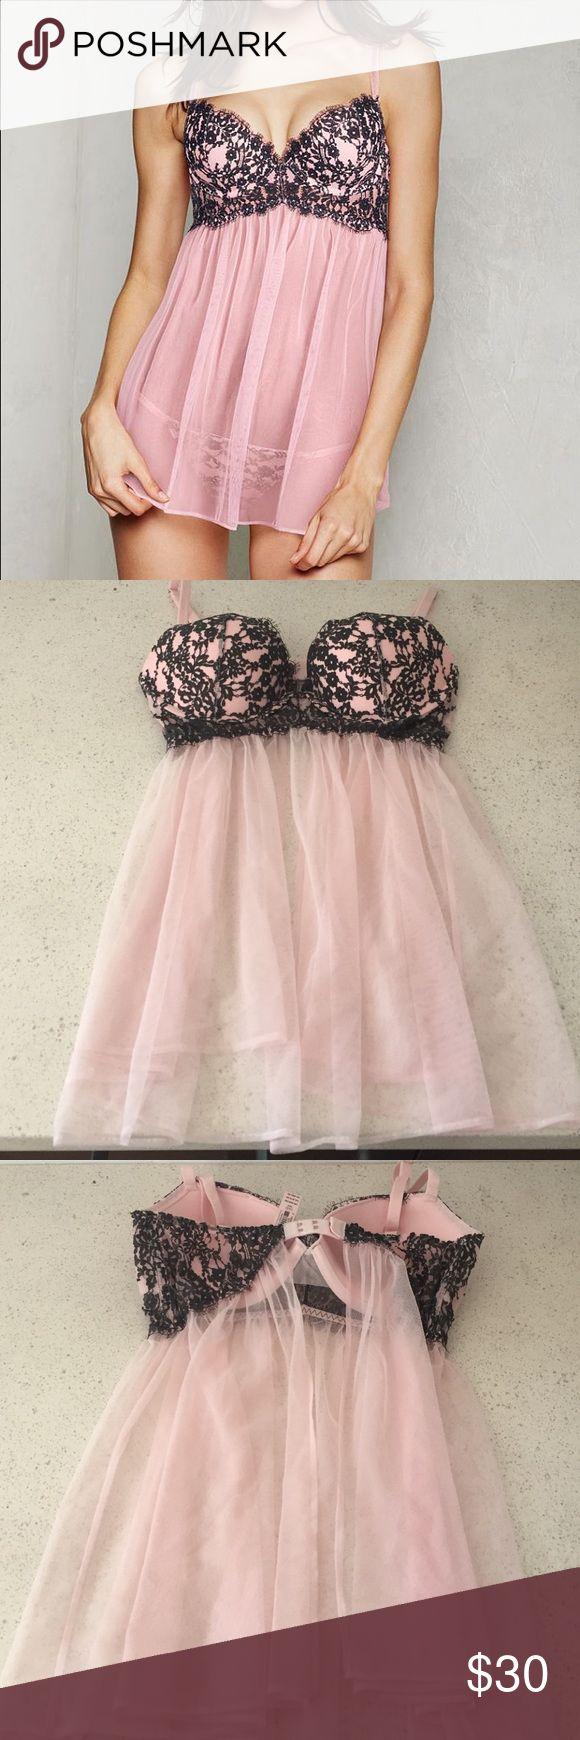 New! 36C VS babydoll lingerie Brand new! Victoria's Secret babydoll lingerie. Size 36C Victoria's Secret Intimates & Sleepwear